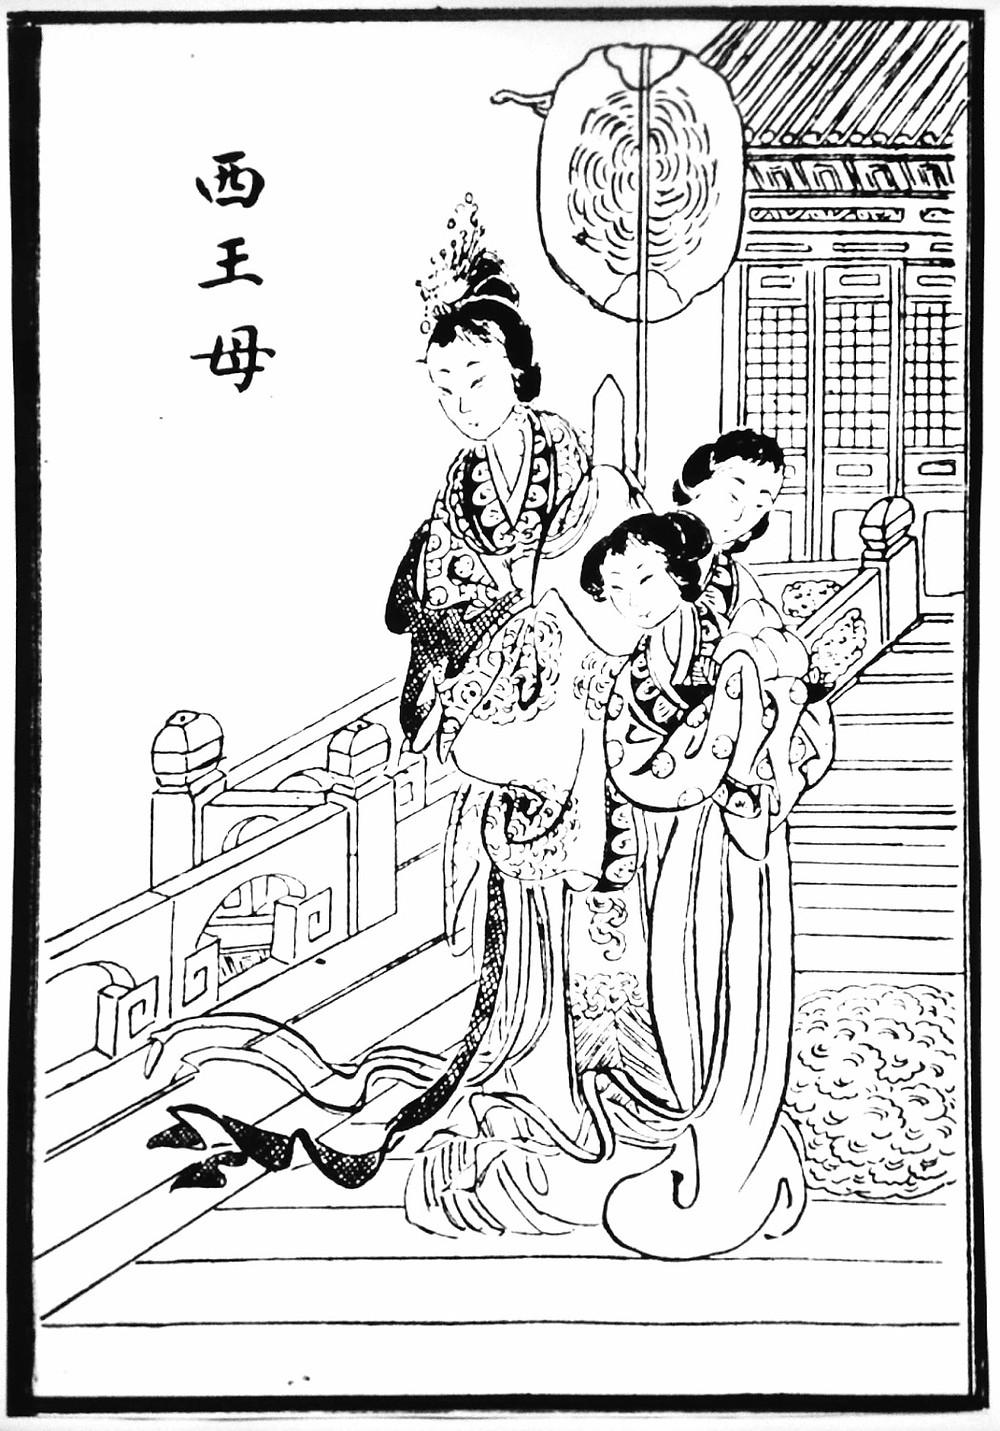 Lännen kuningataräiti. Kuva alunperin teoksesta Zengxian liexian zhuan. (Women in Daoism, 2003.)